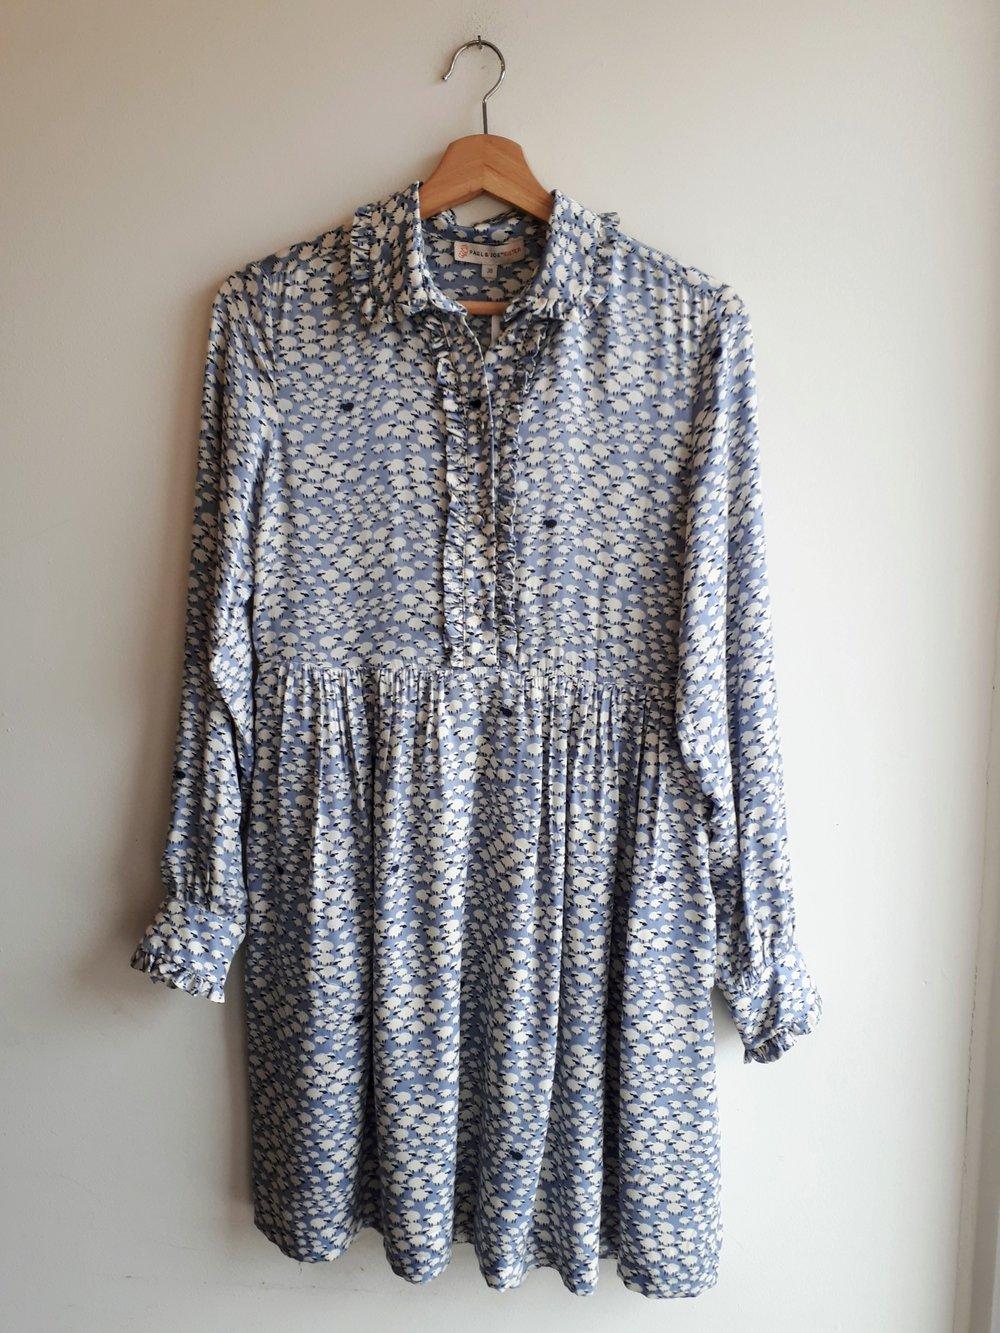 Paul and Joe Sister dress; Size 8, $42